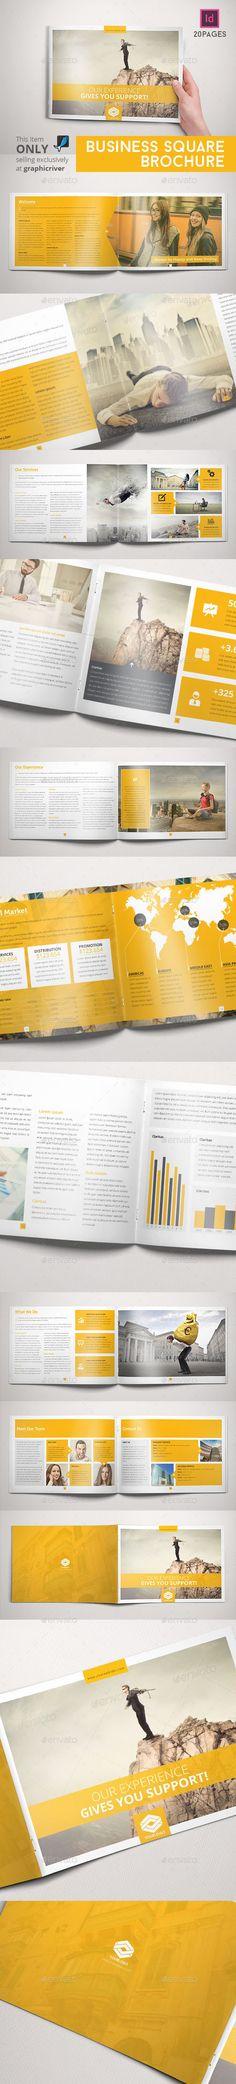 Business Brochure Indesign Horizontal - Informational Brochures